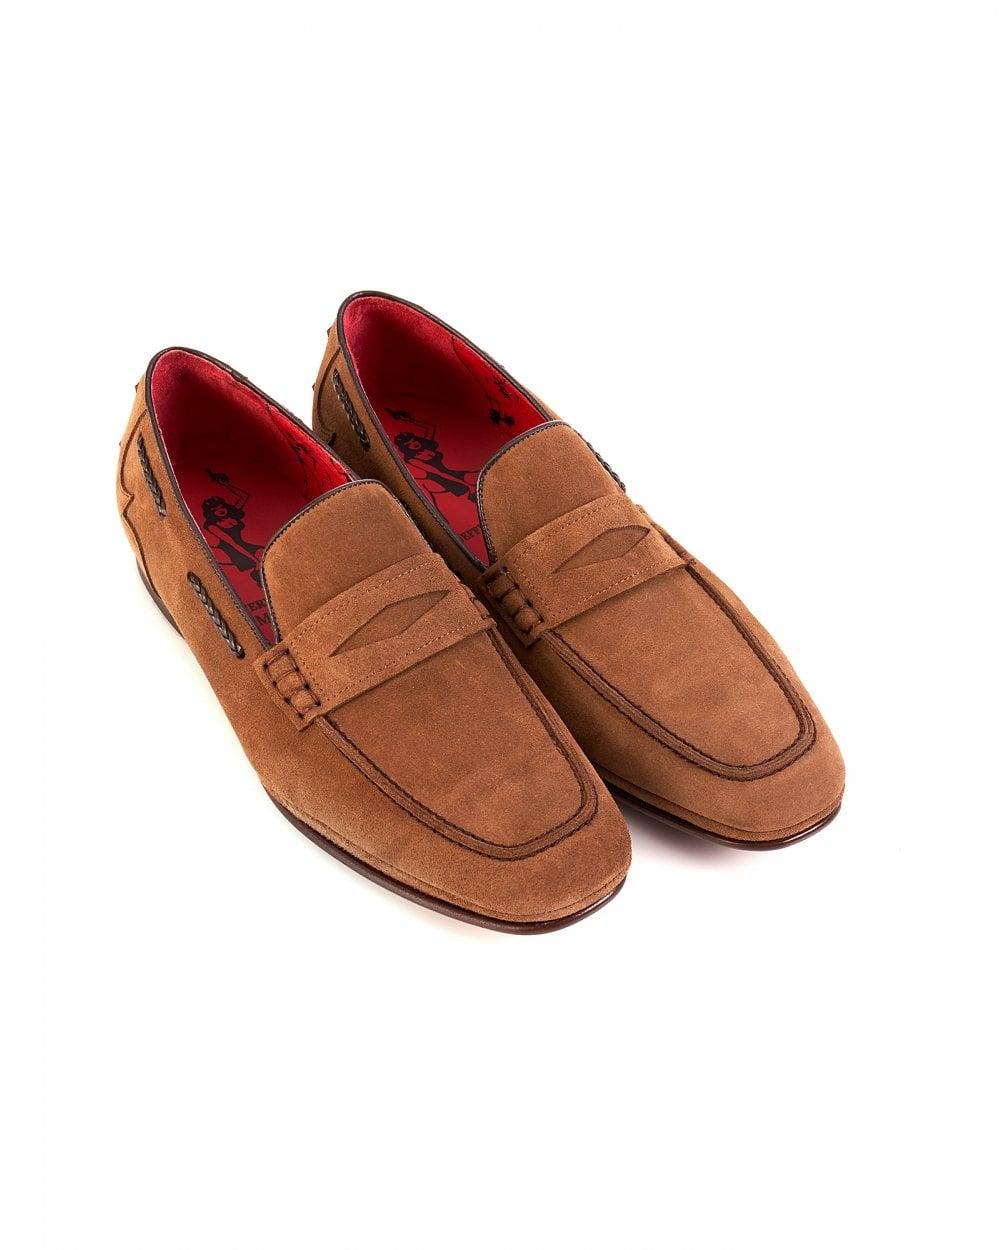 6e8ad437765 Jeffery West Shoes Mens Muse Suede Shoes